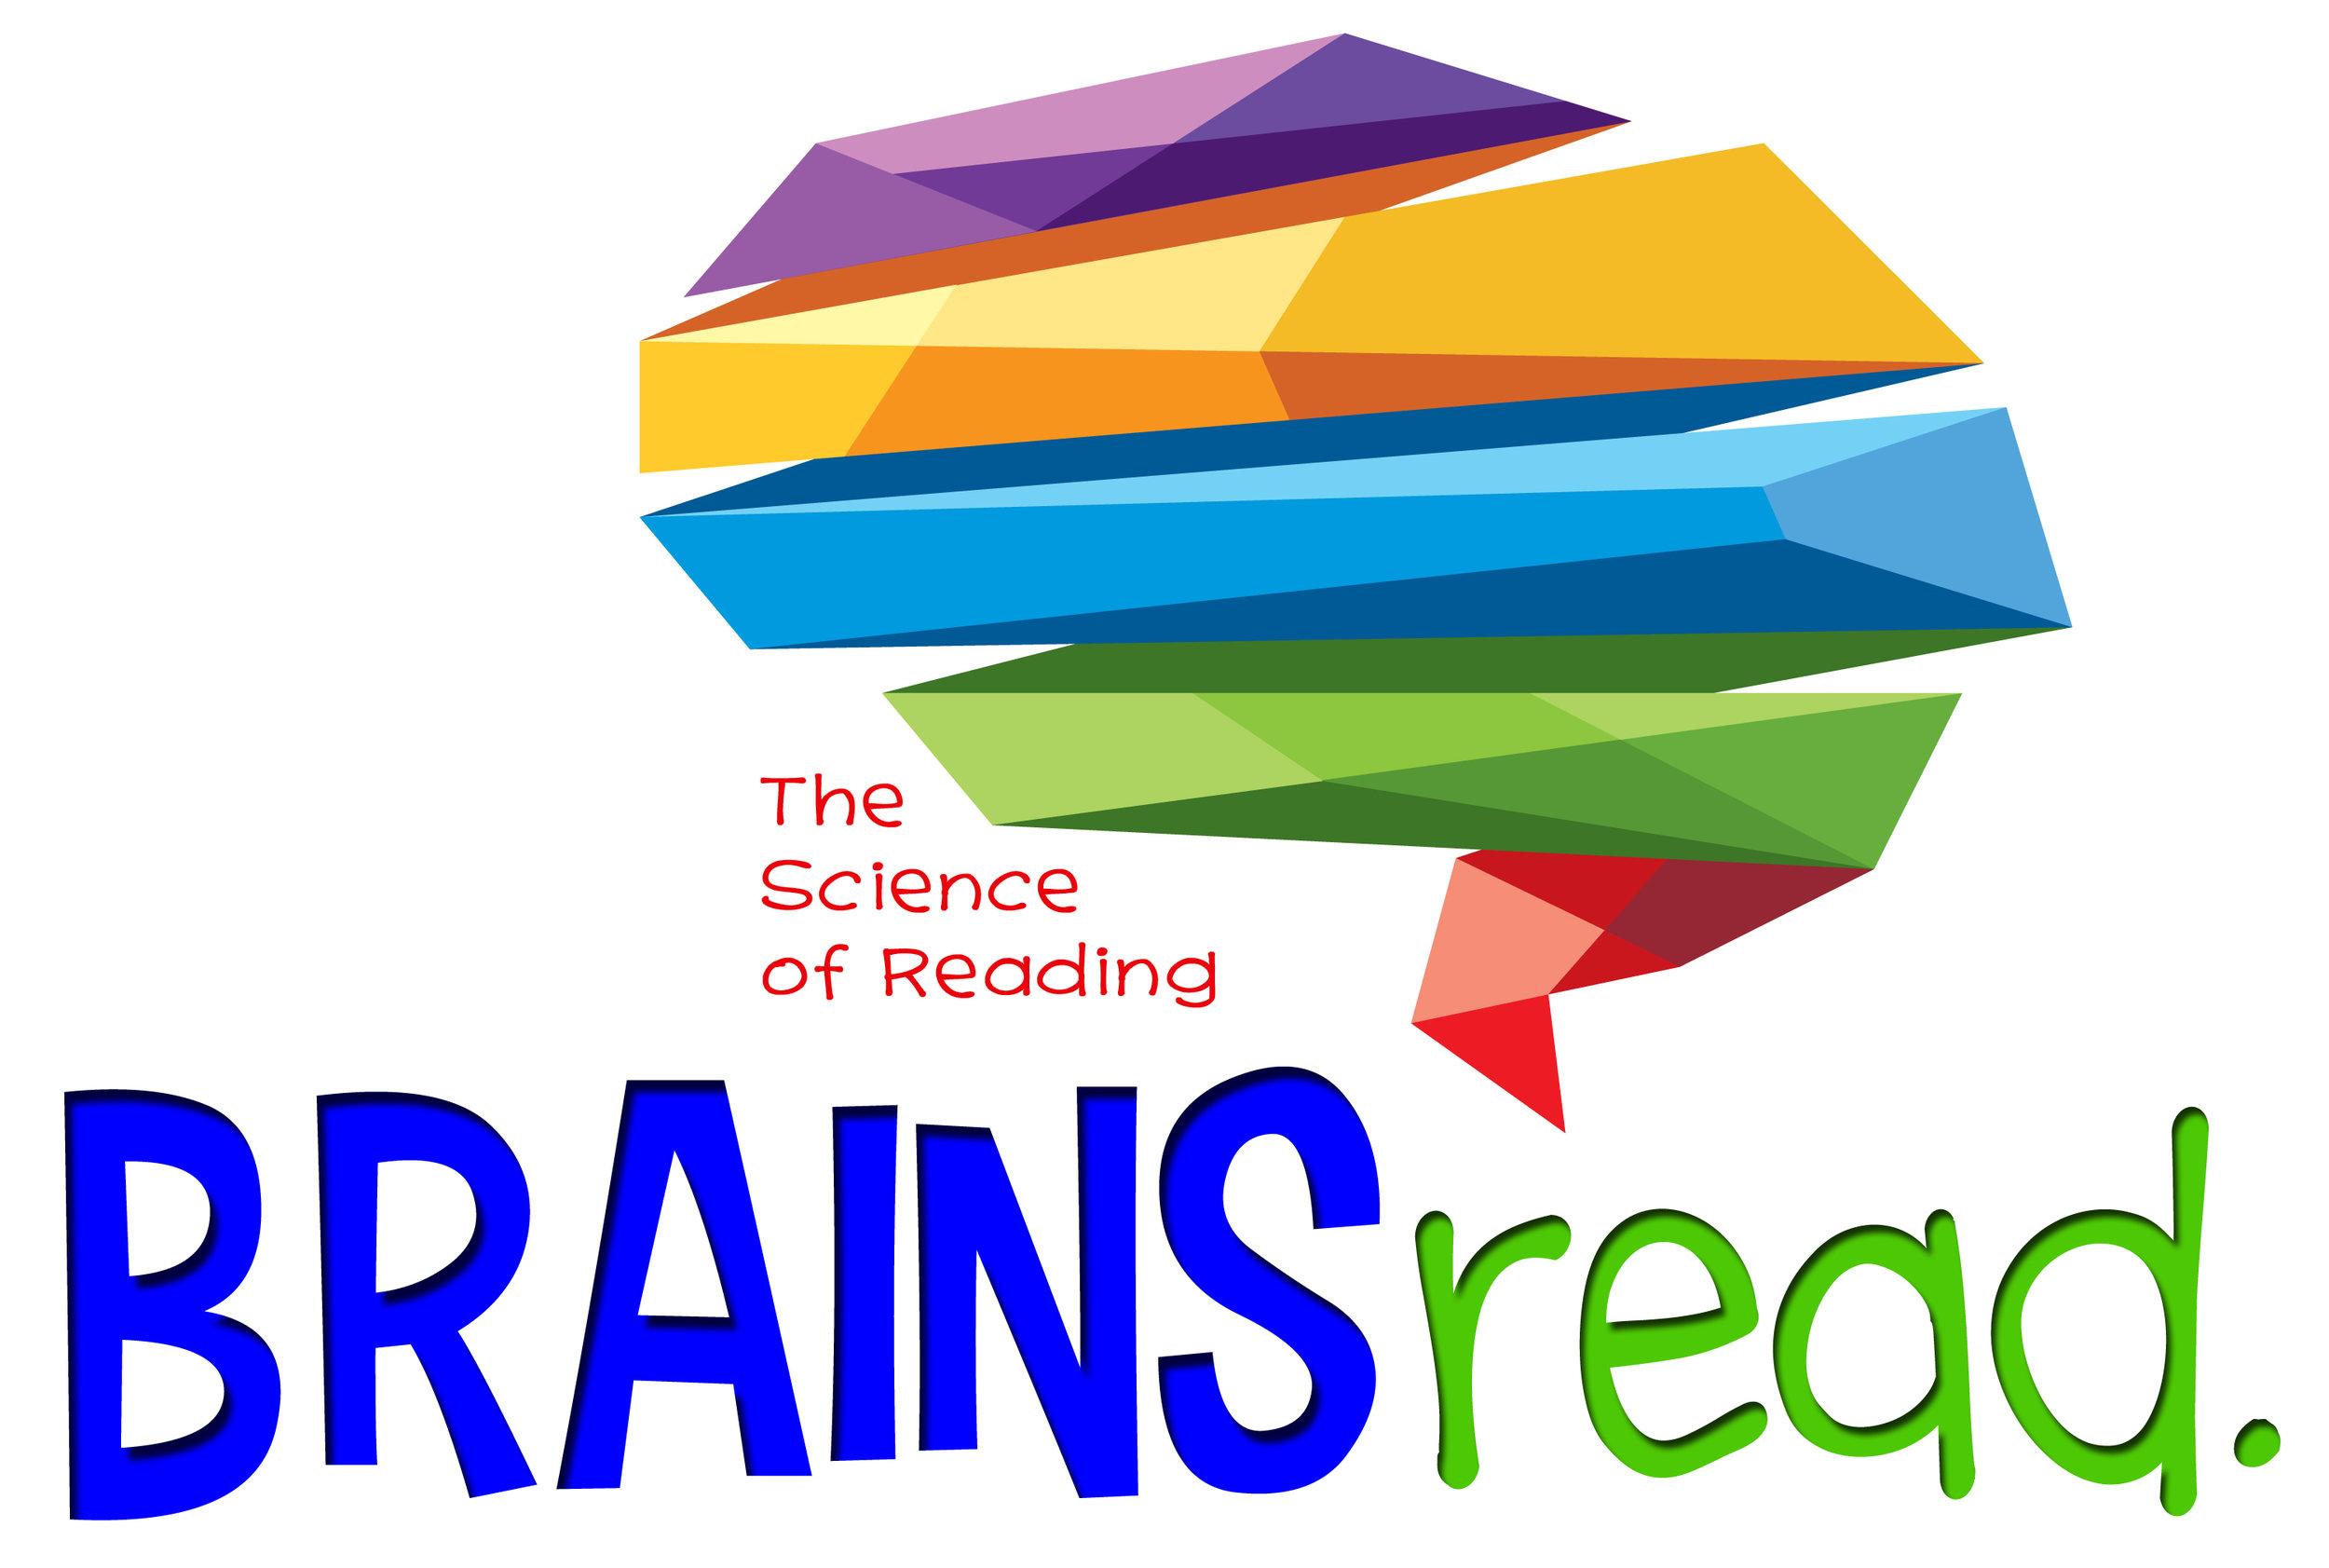 3-Day Training - Audience: 7-12 Teachers, K-6 Teachers (requiring awareness-level training)